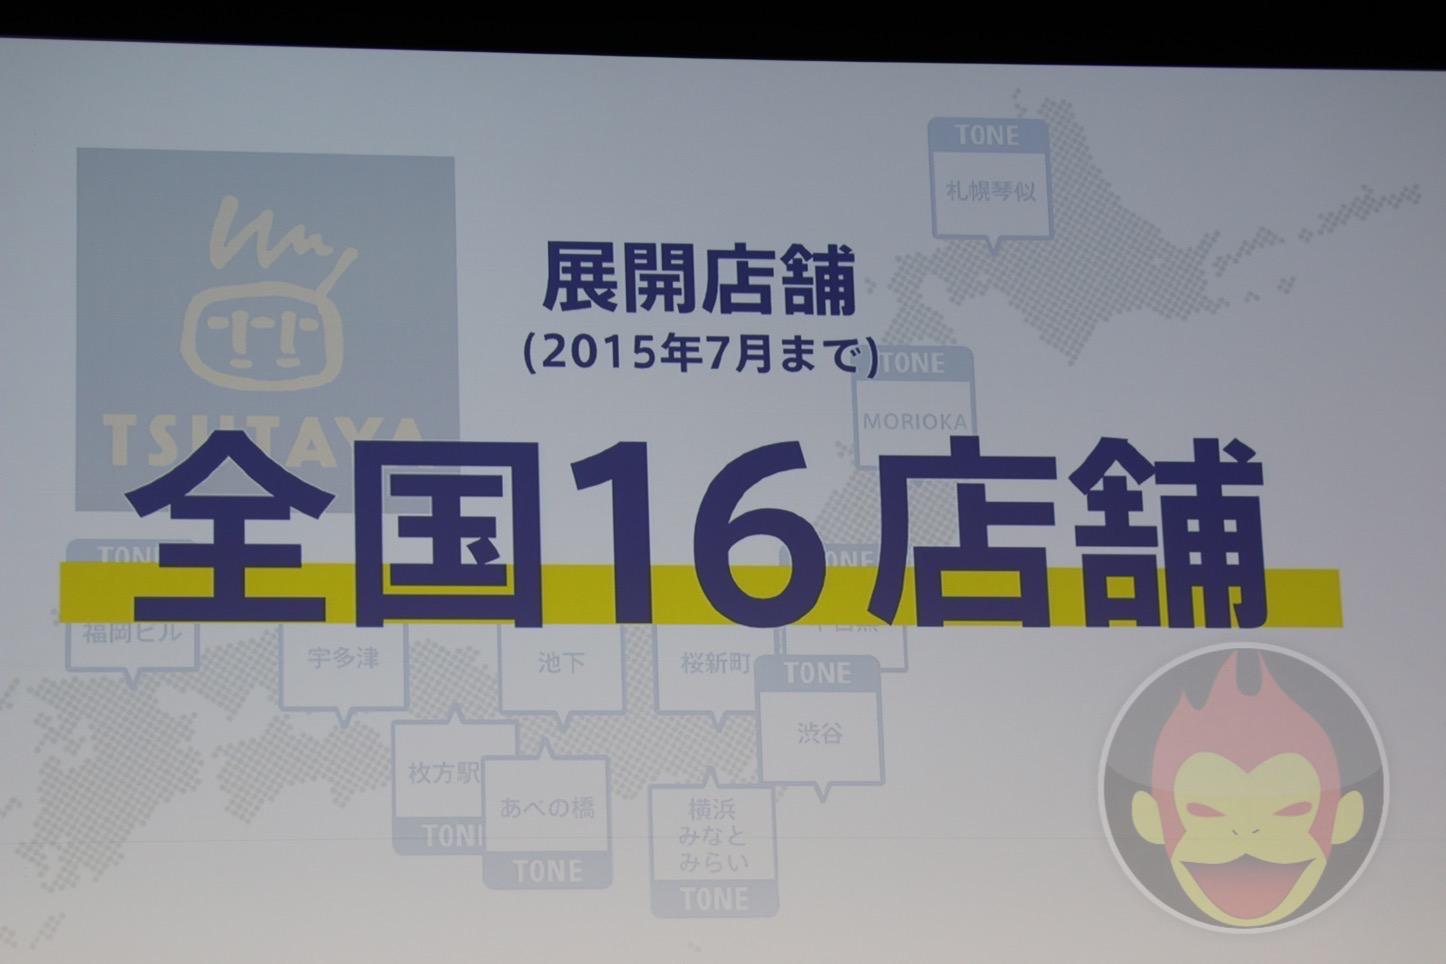 Tone-Mobile-002.JPG